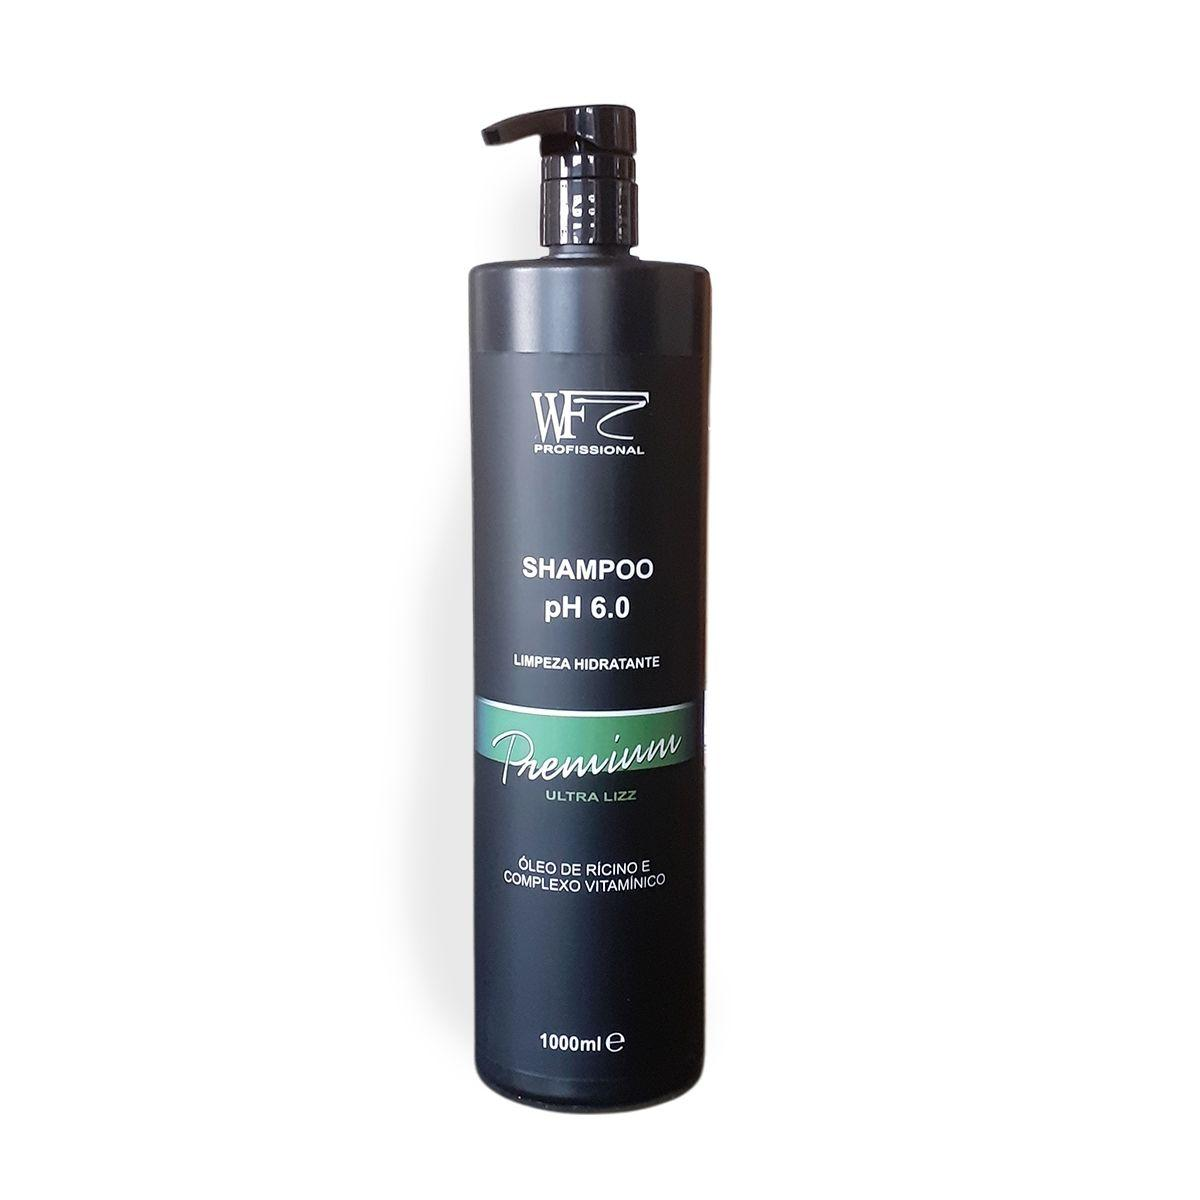 PREMIUM - Shampoo Ultra Lizz WF COSMETICOS 1000ml